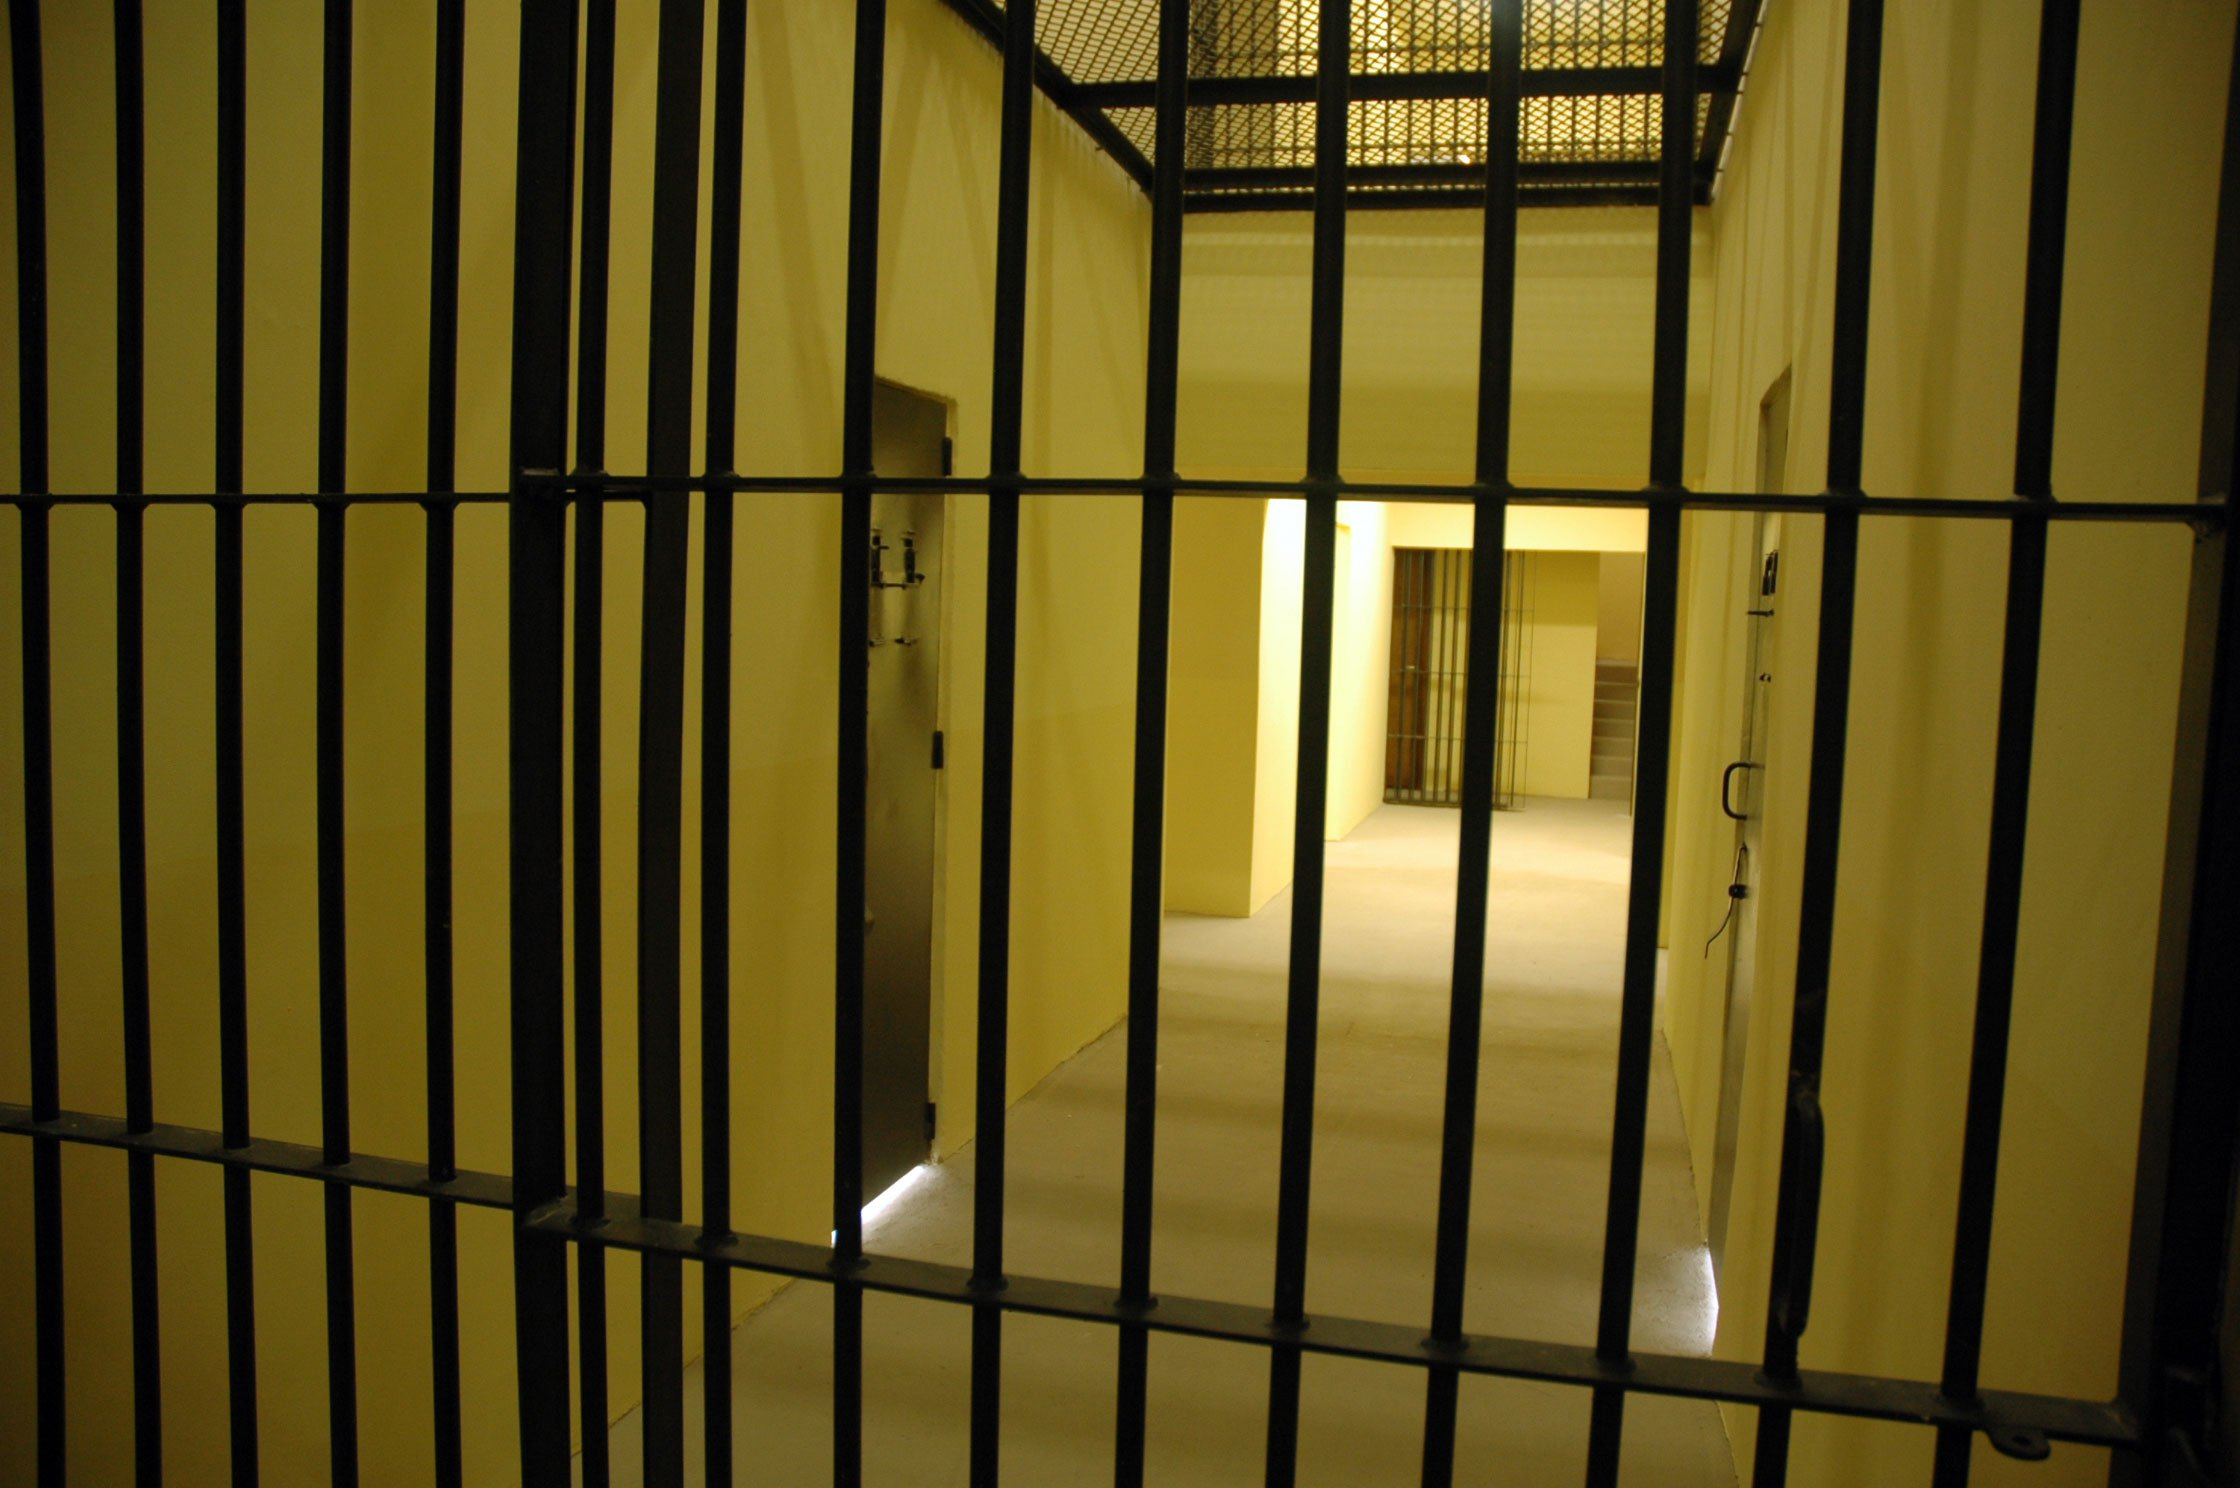 penitentiary-3-1234018.jpg